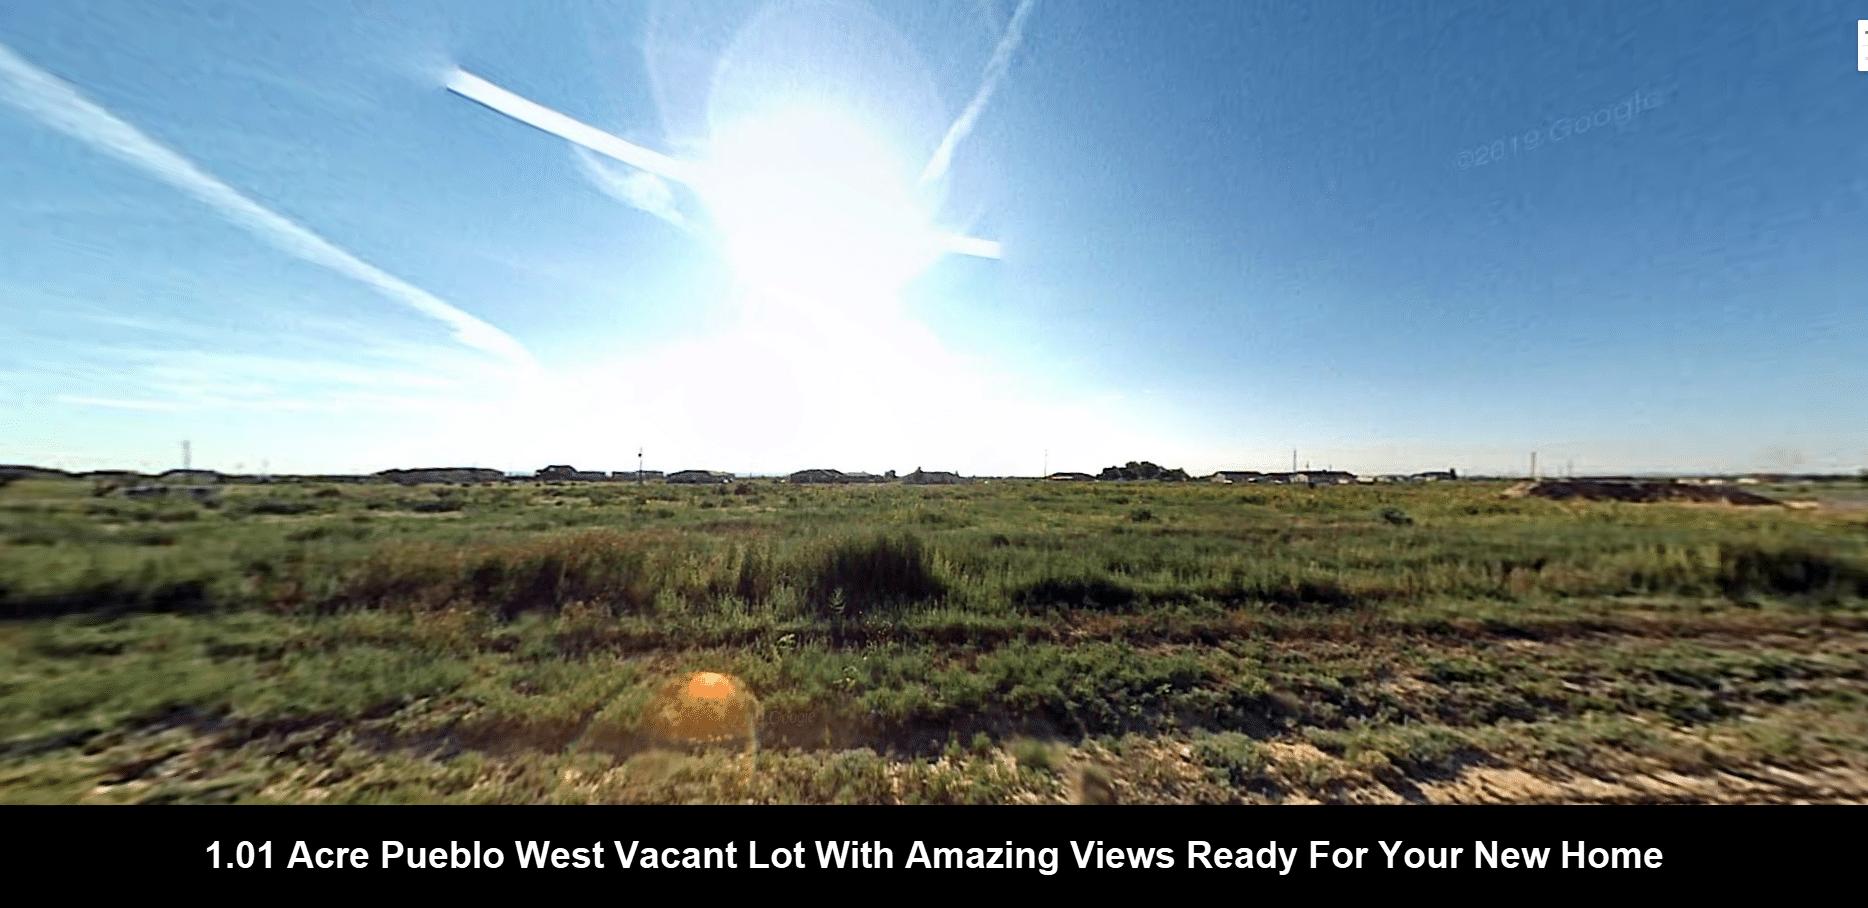 1.01 Acres Pueblo West Vacant Land Homesite With Amazing Views